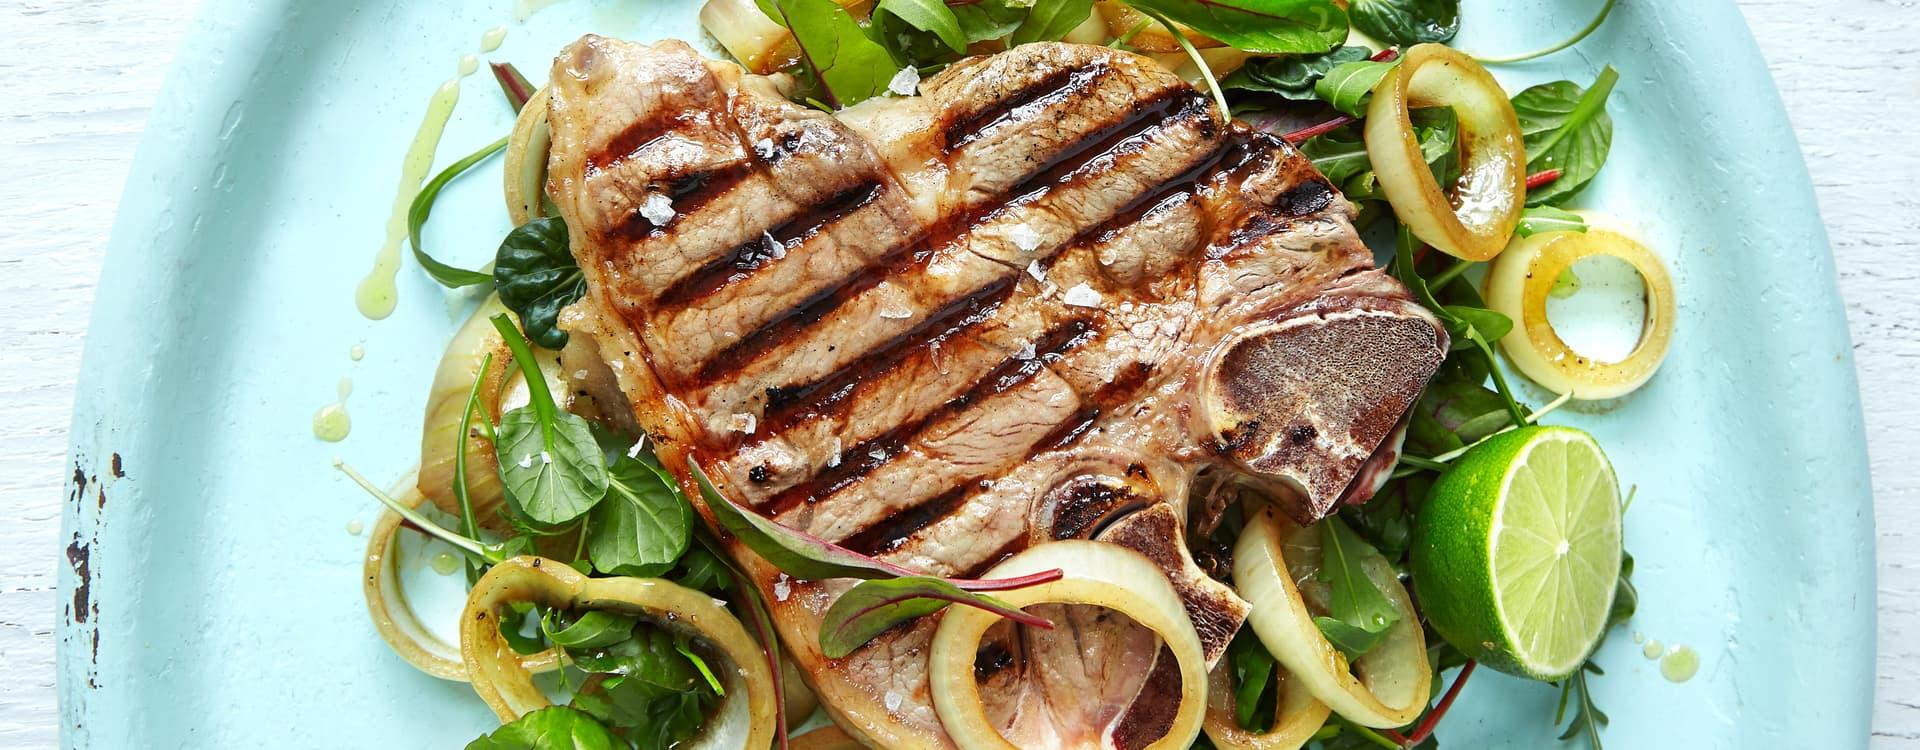 Grillet T-bone steak med honninggrillet løk, varm soyavinaigrette & salatblanding